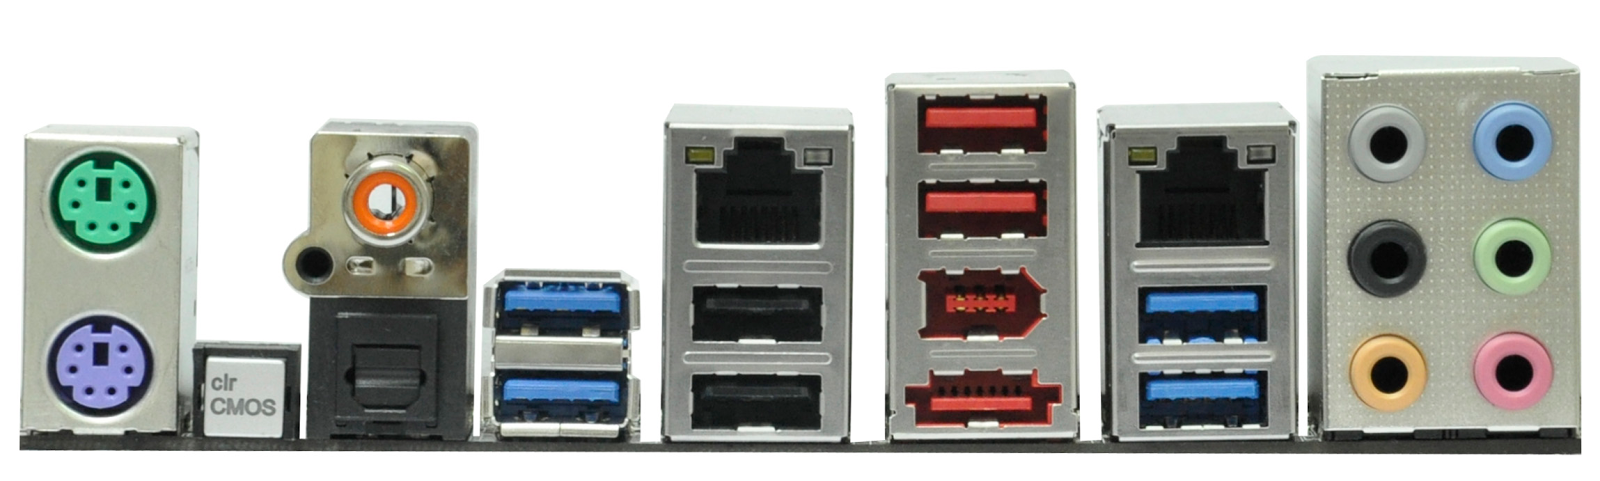 NKRO на USB. Проблемы и костыли при их решениях - 4